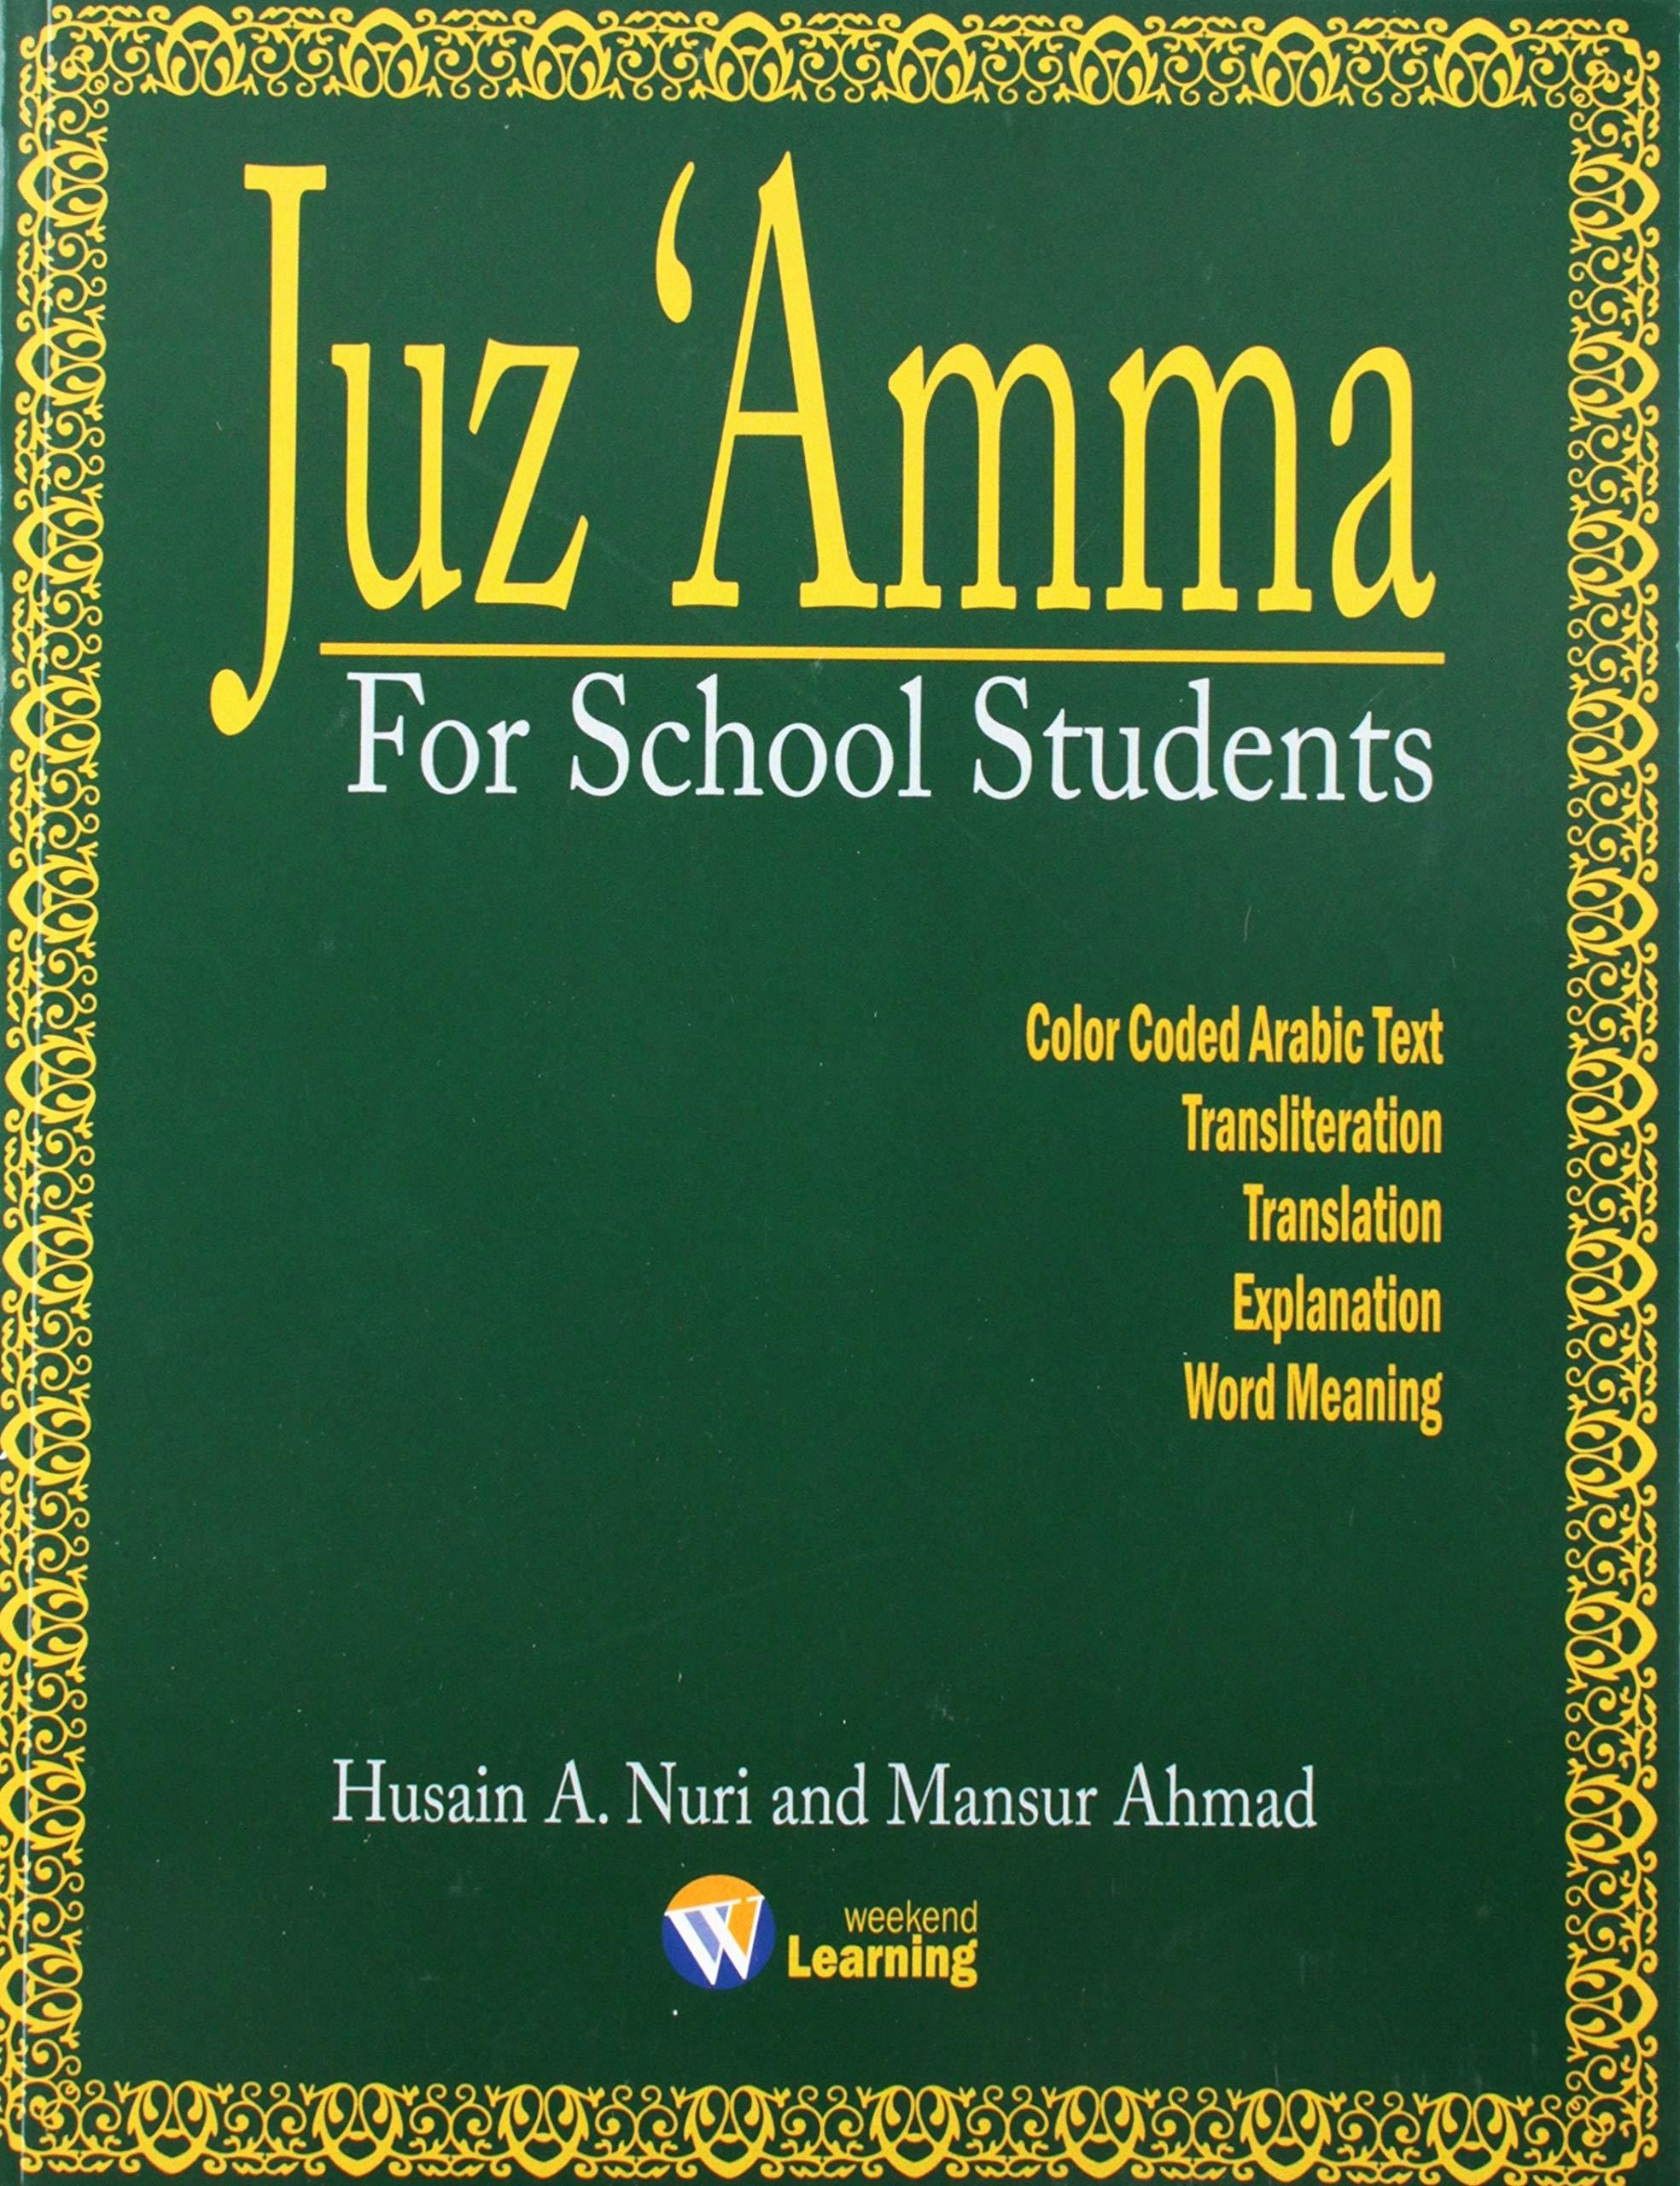 Juz' Amma for School Students: Amazon co uk: Husain A  Nuri